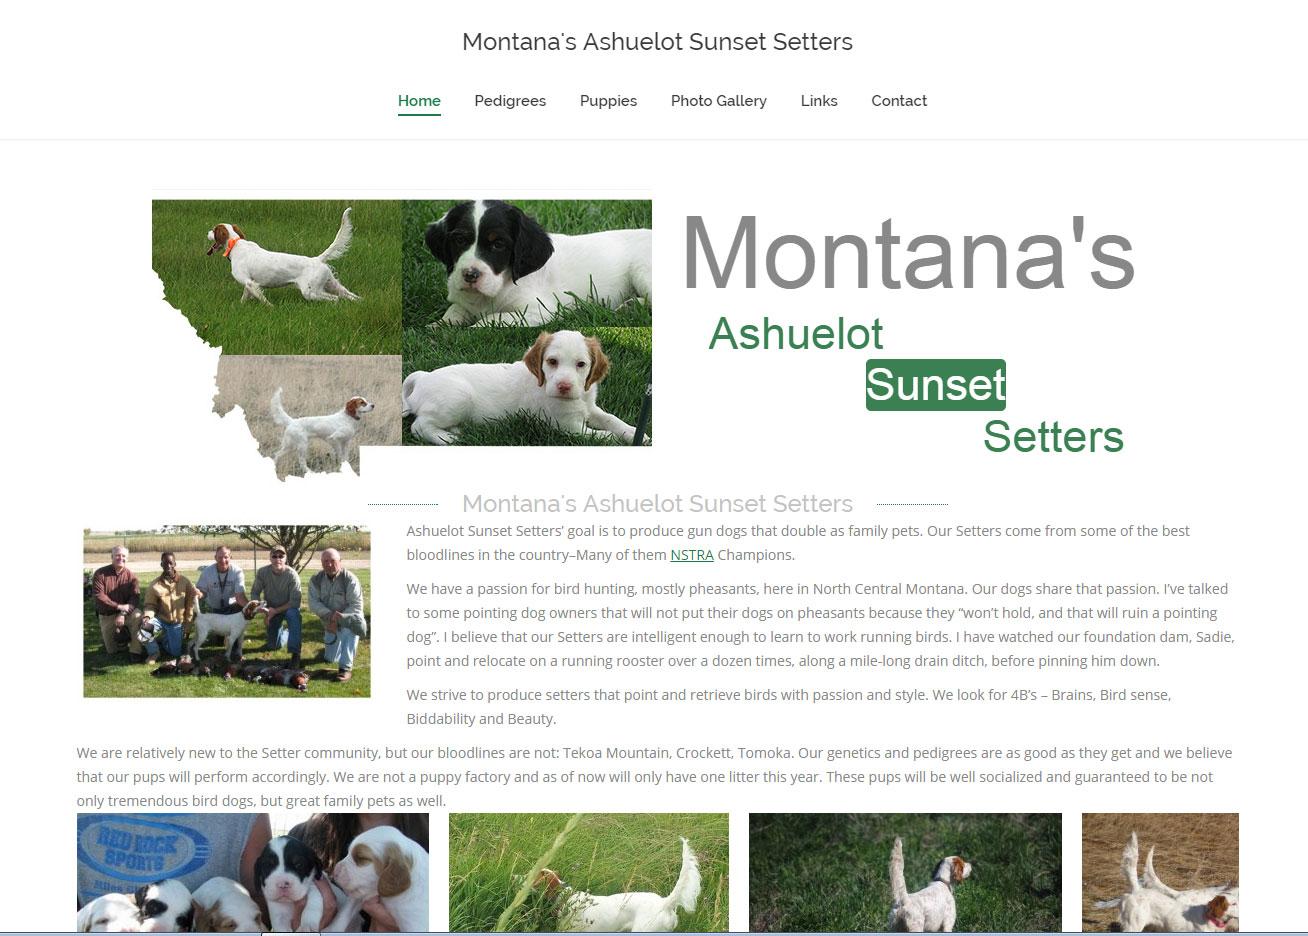 Montana's Ashuelot Sunset Setters